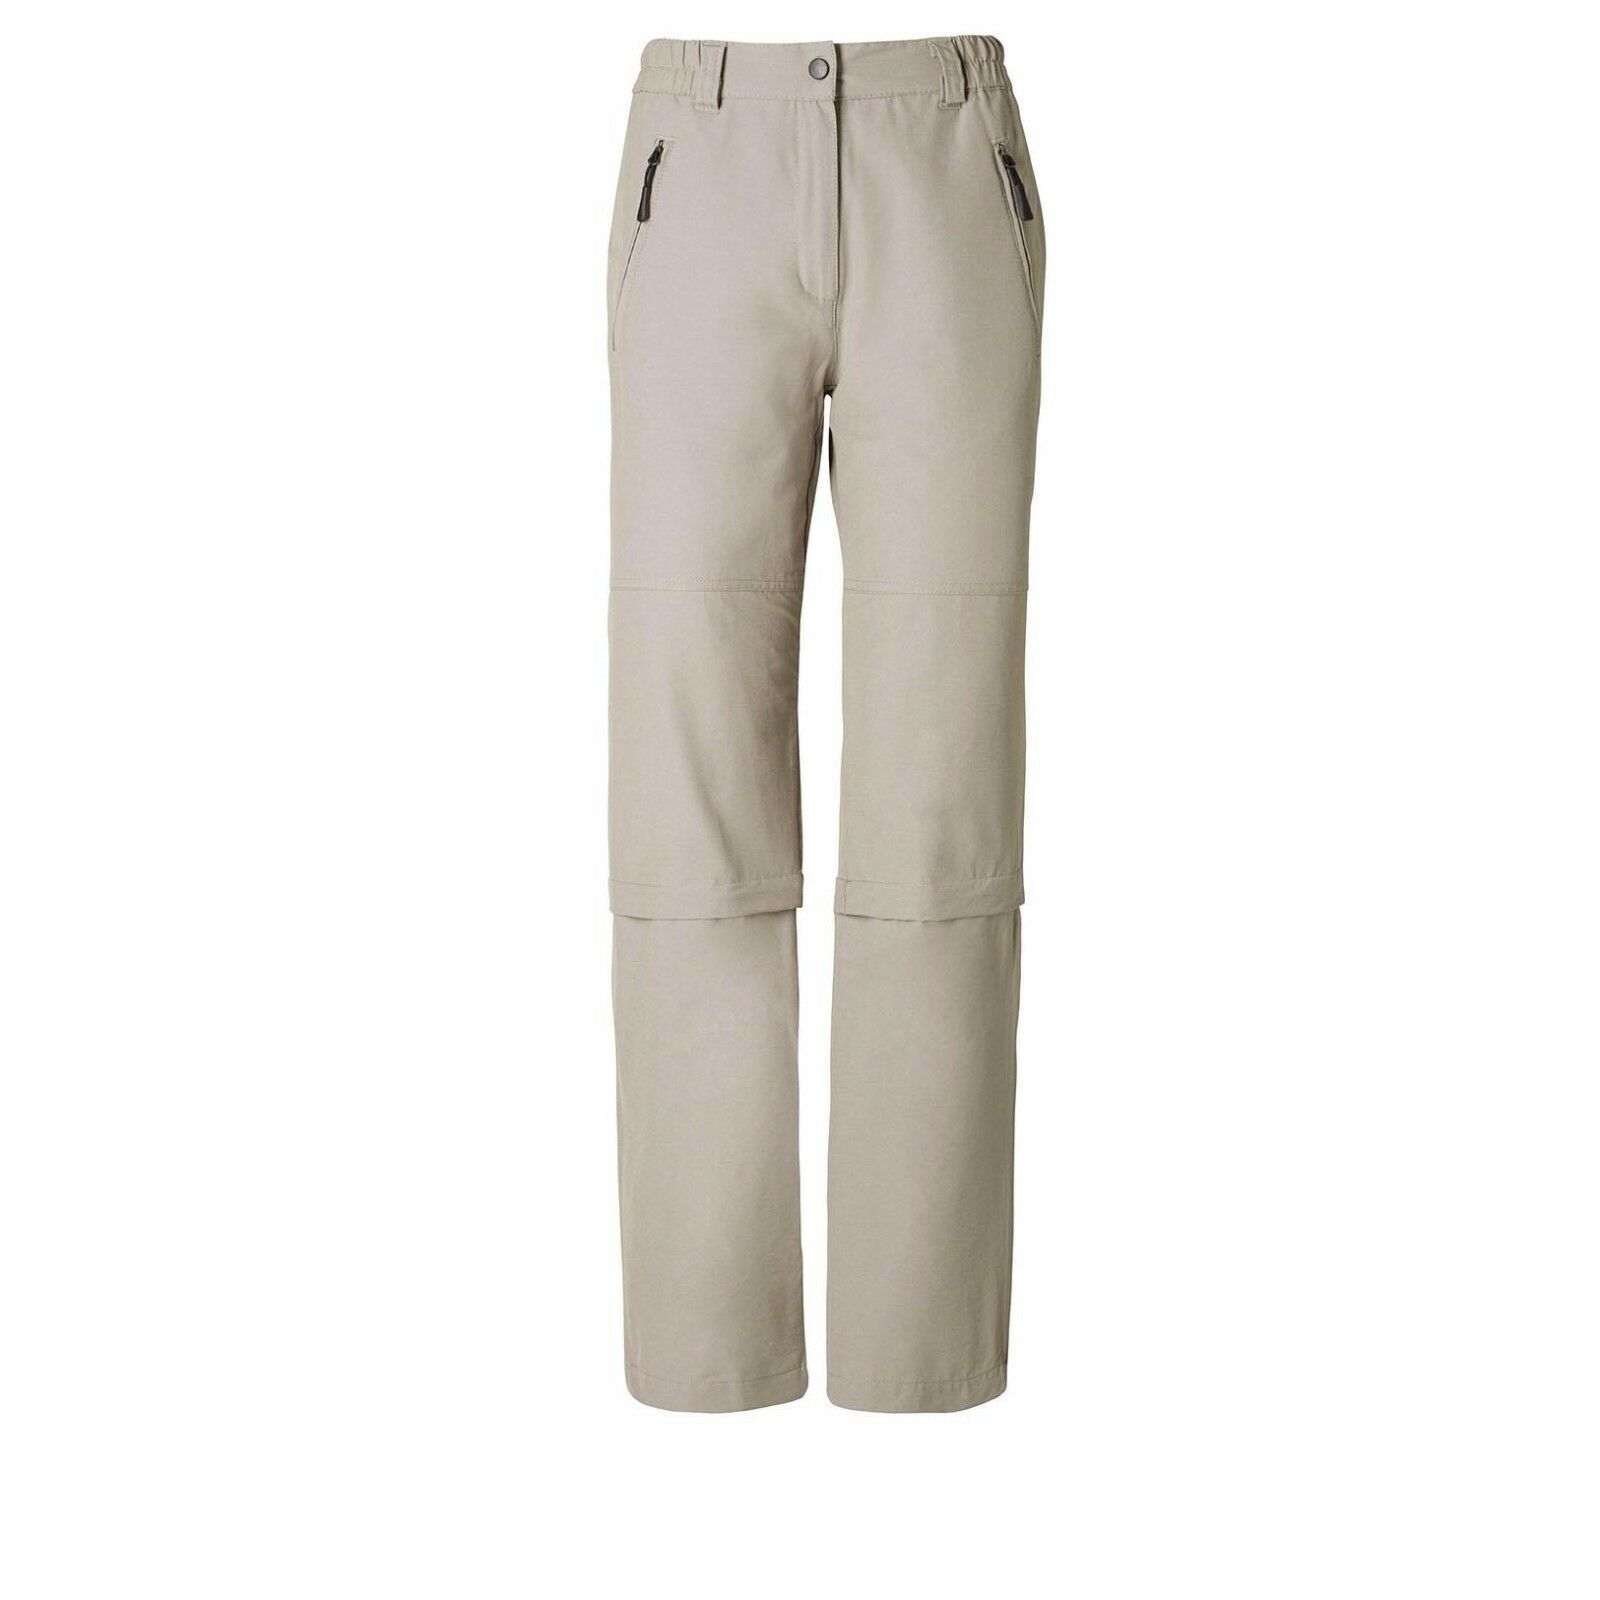 Hot Sportswear Bursa Damen Trekking Wander Hose bis Gr. 52  79 95 Kurzgröße